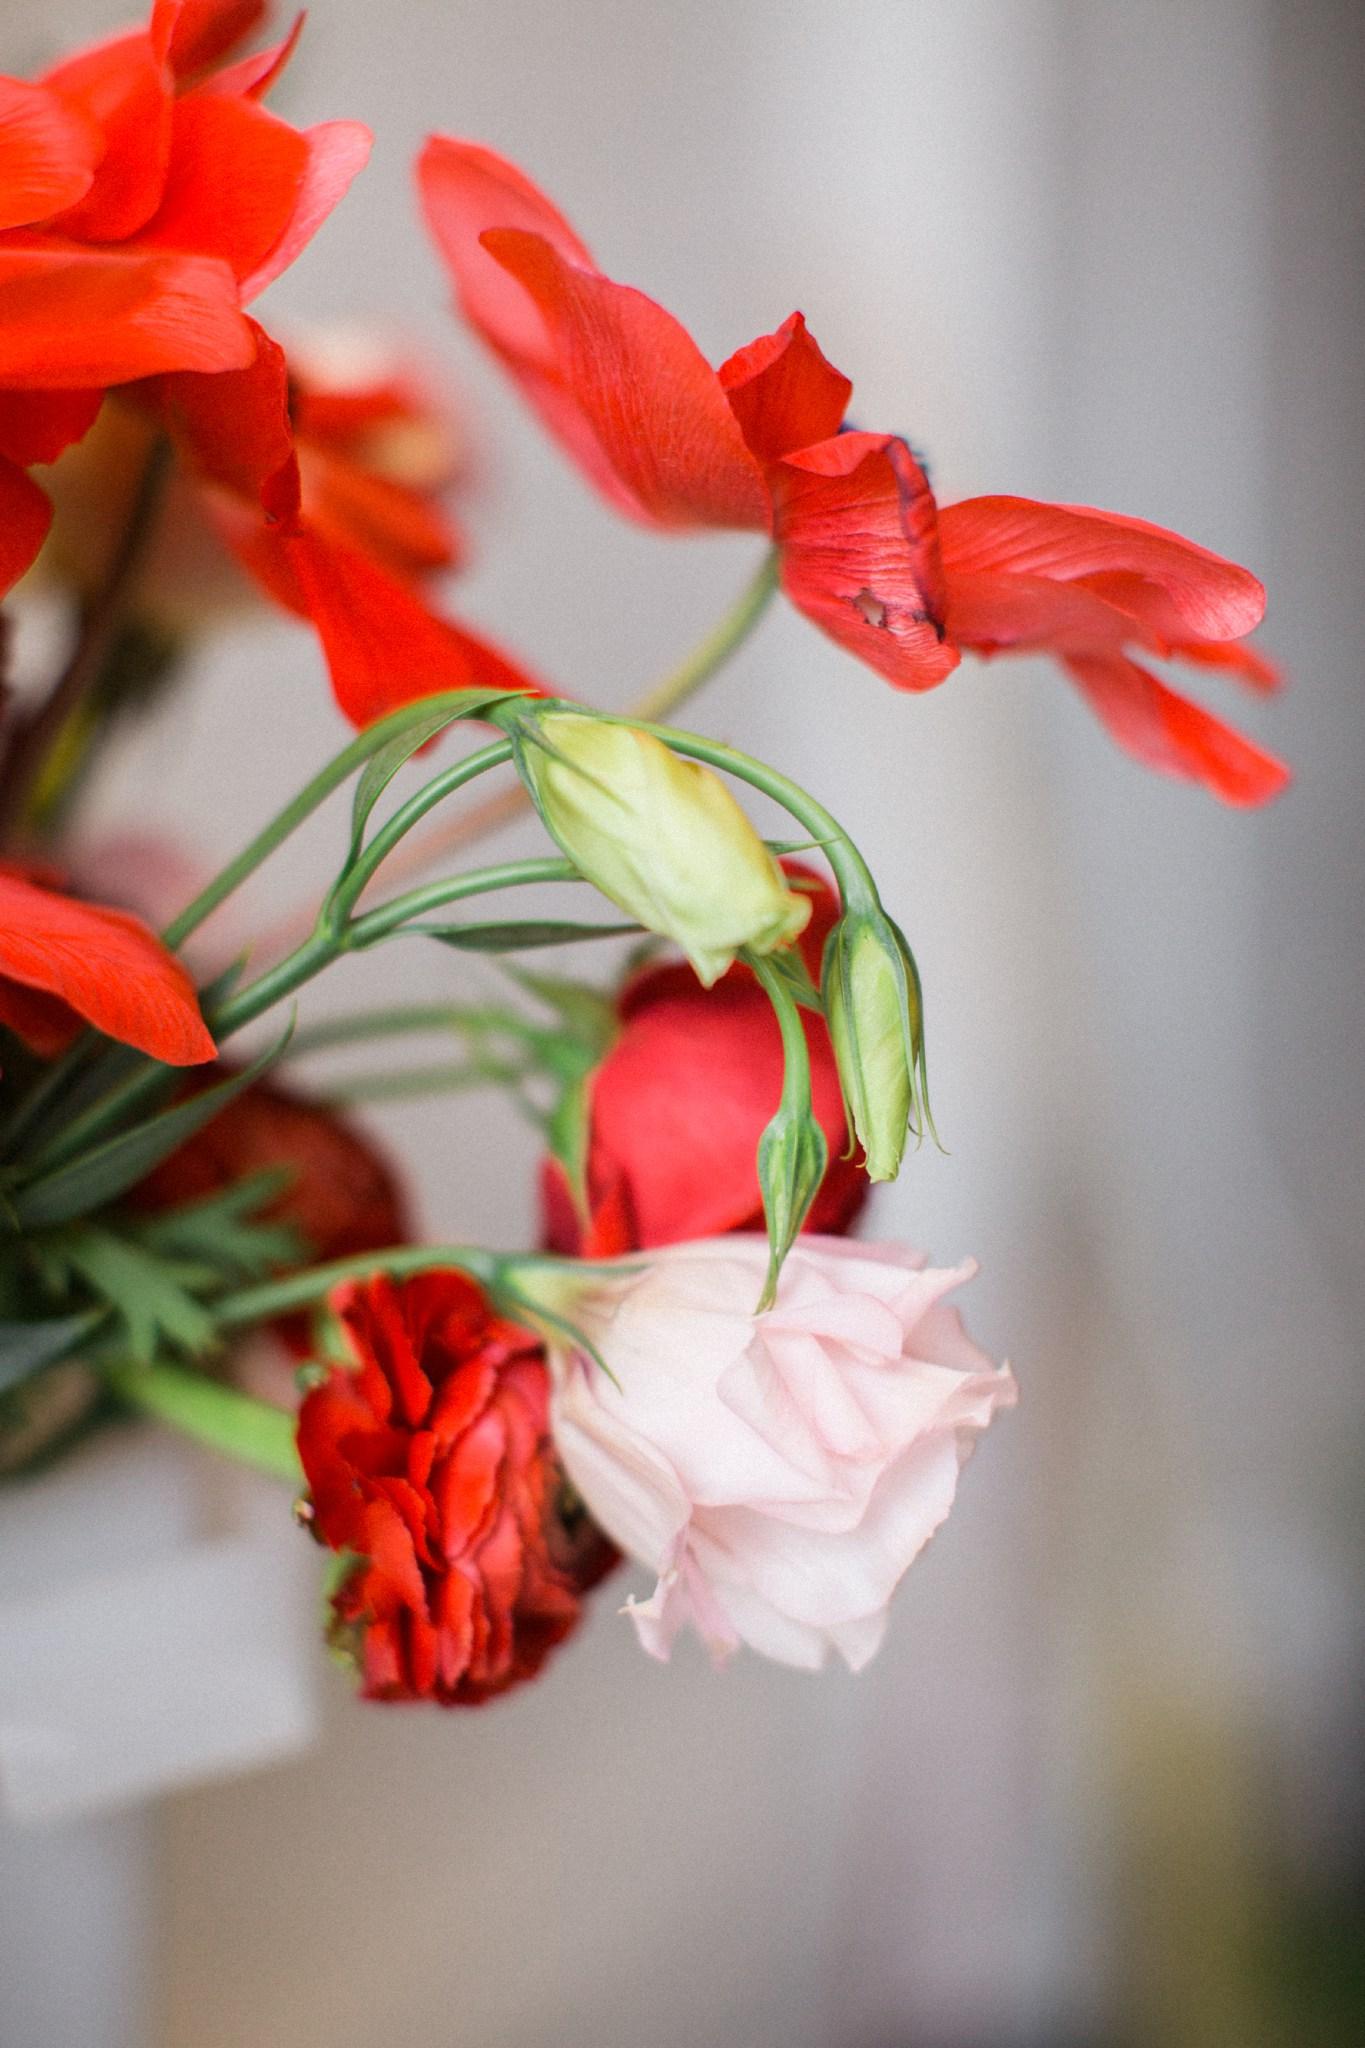 deborah_zoe_photography_best_of_flowers_2016_00027.JPG